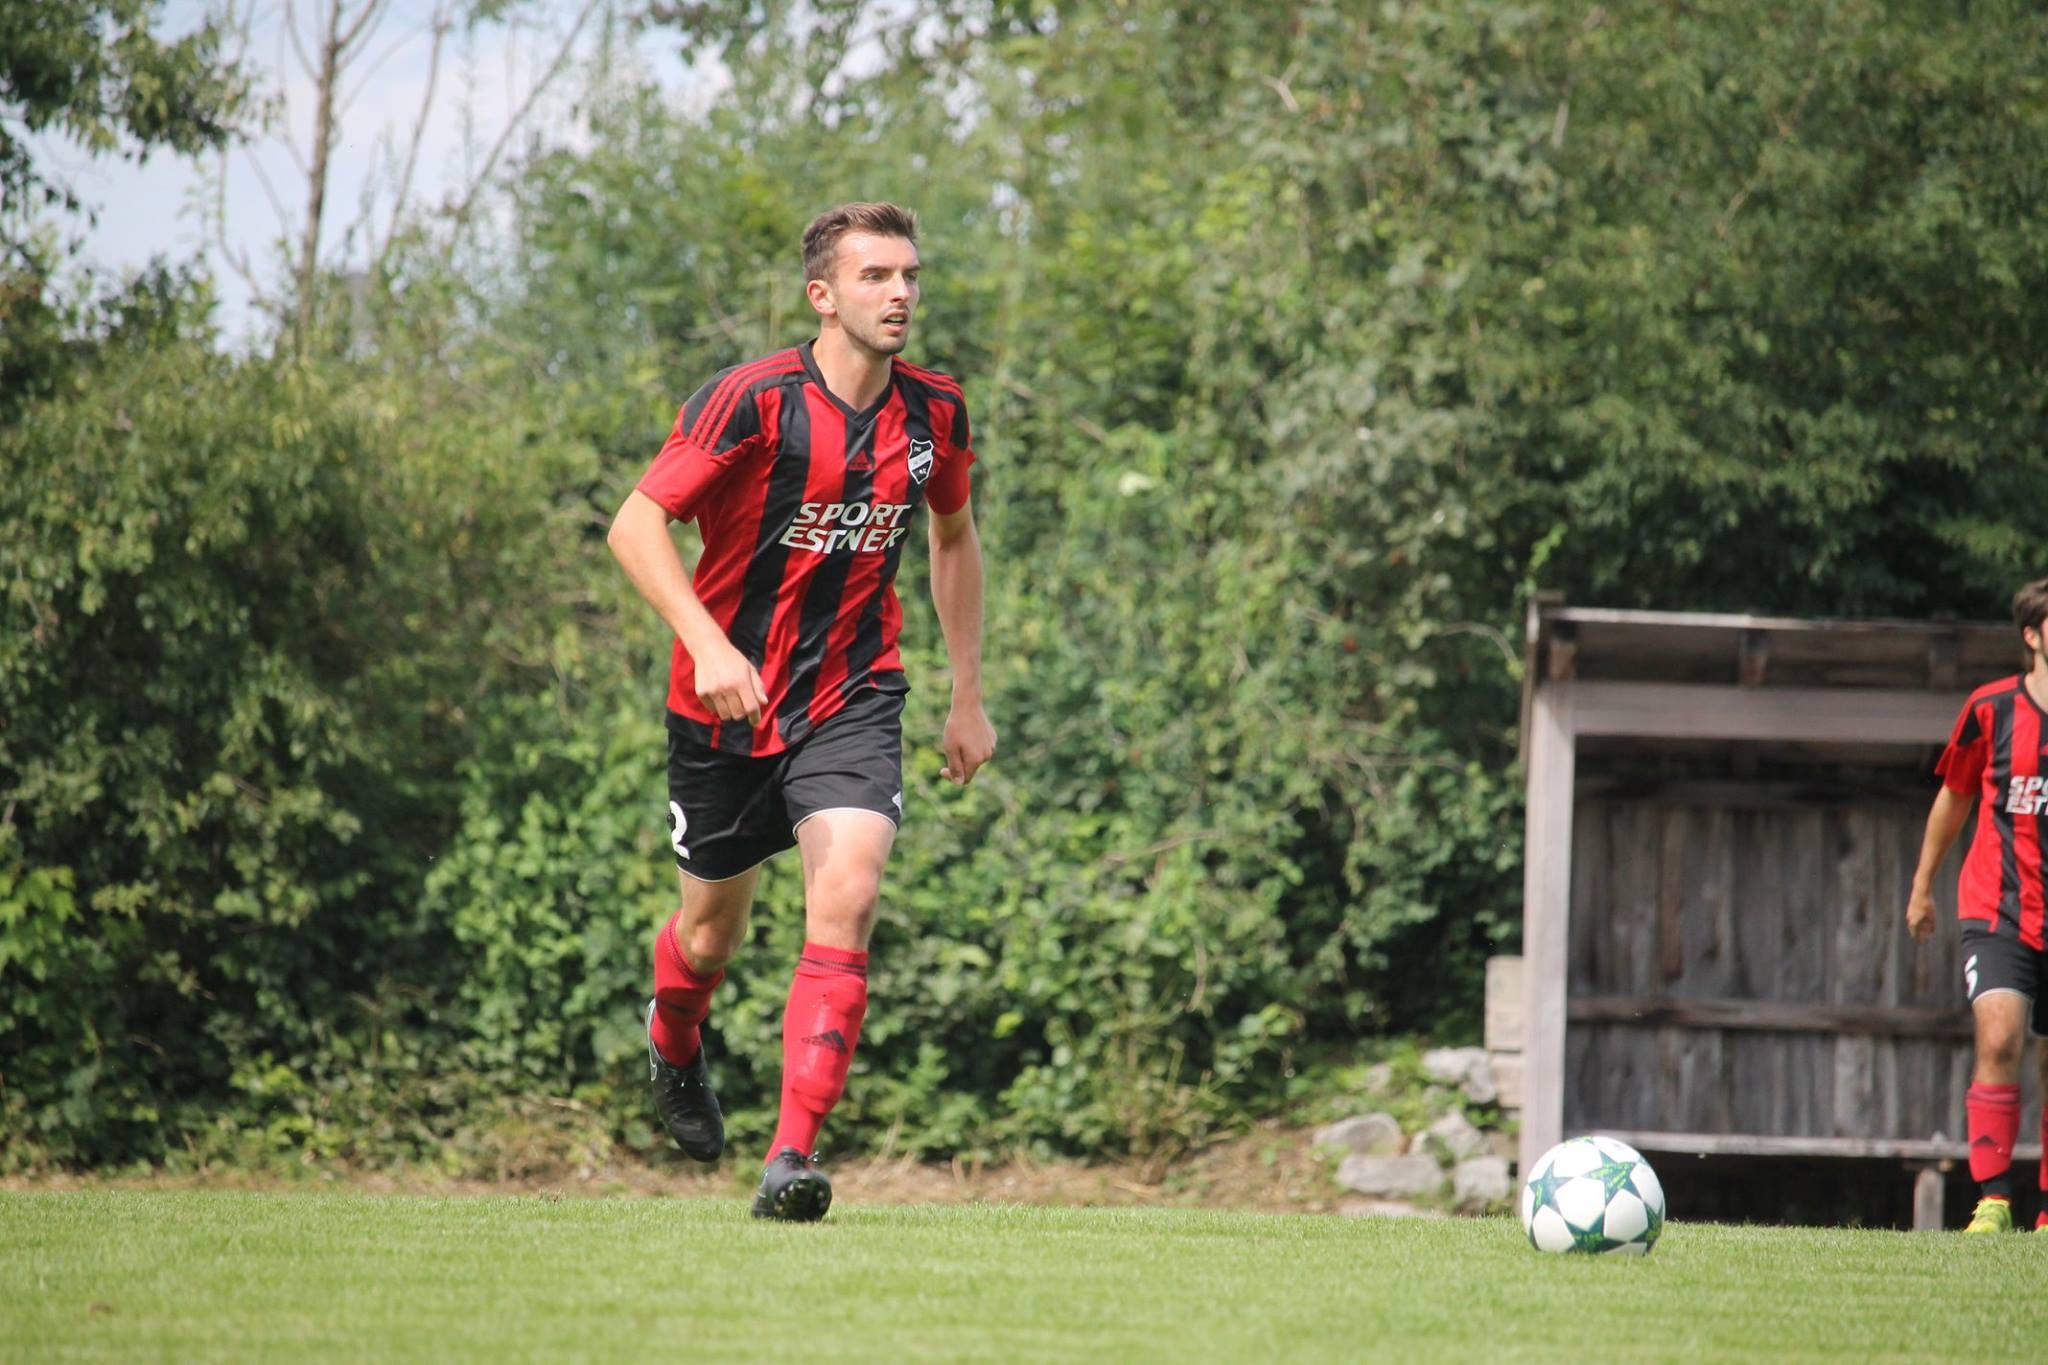 Gegen FC Hausham 7 (6:1) am 15.08.2017